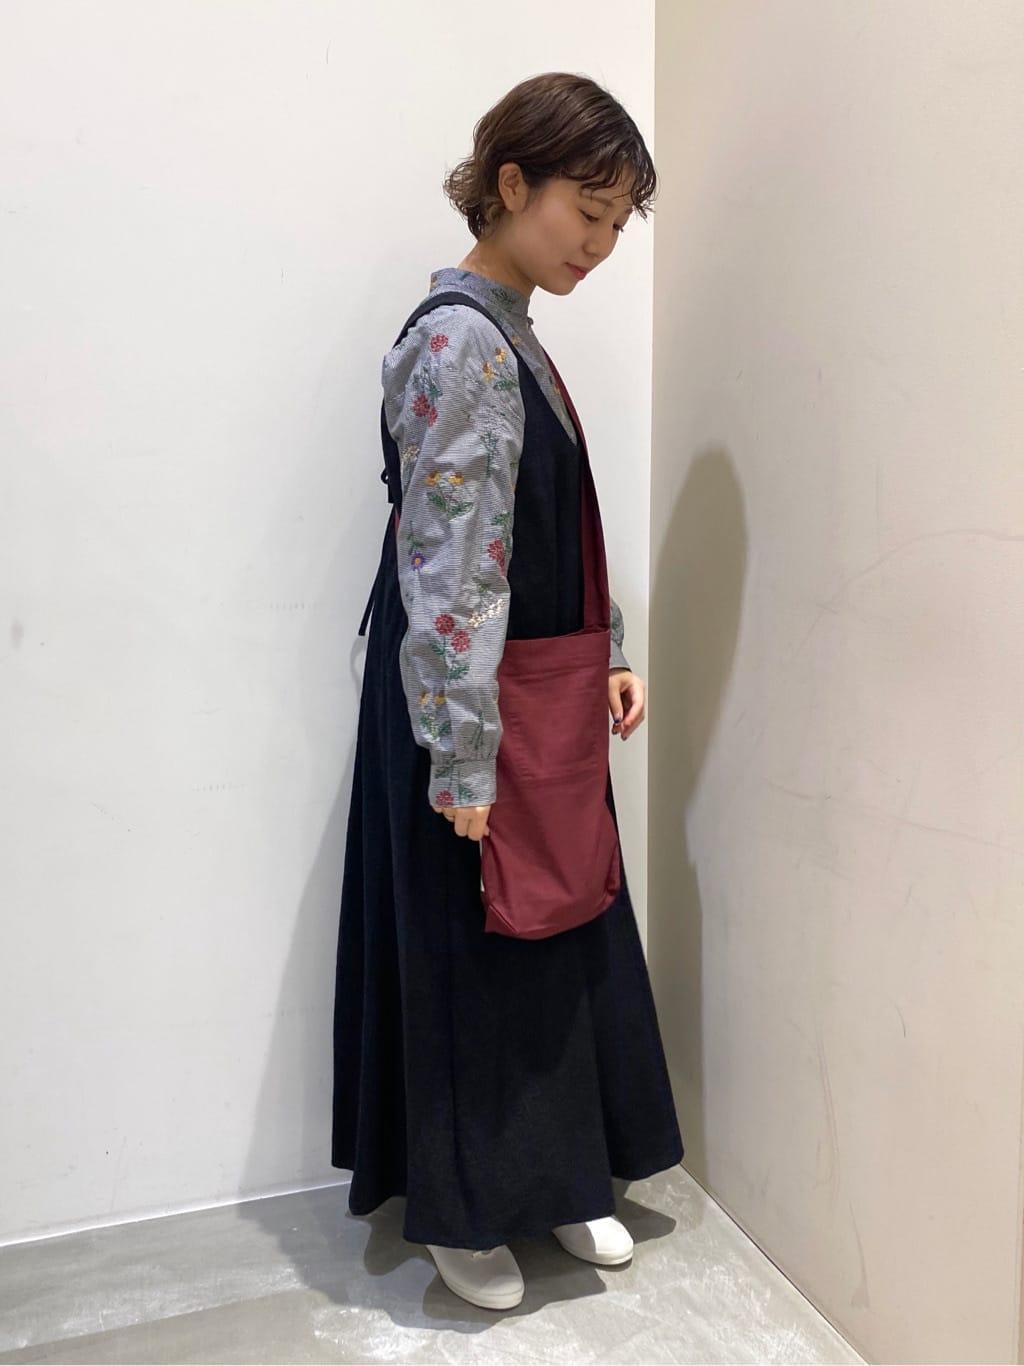 bulle de savon 阪急西宮ガーデンズ 身長:149cm 2021.09.14